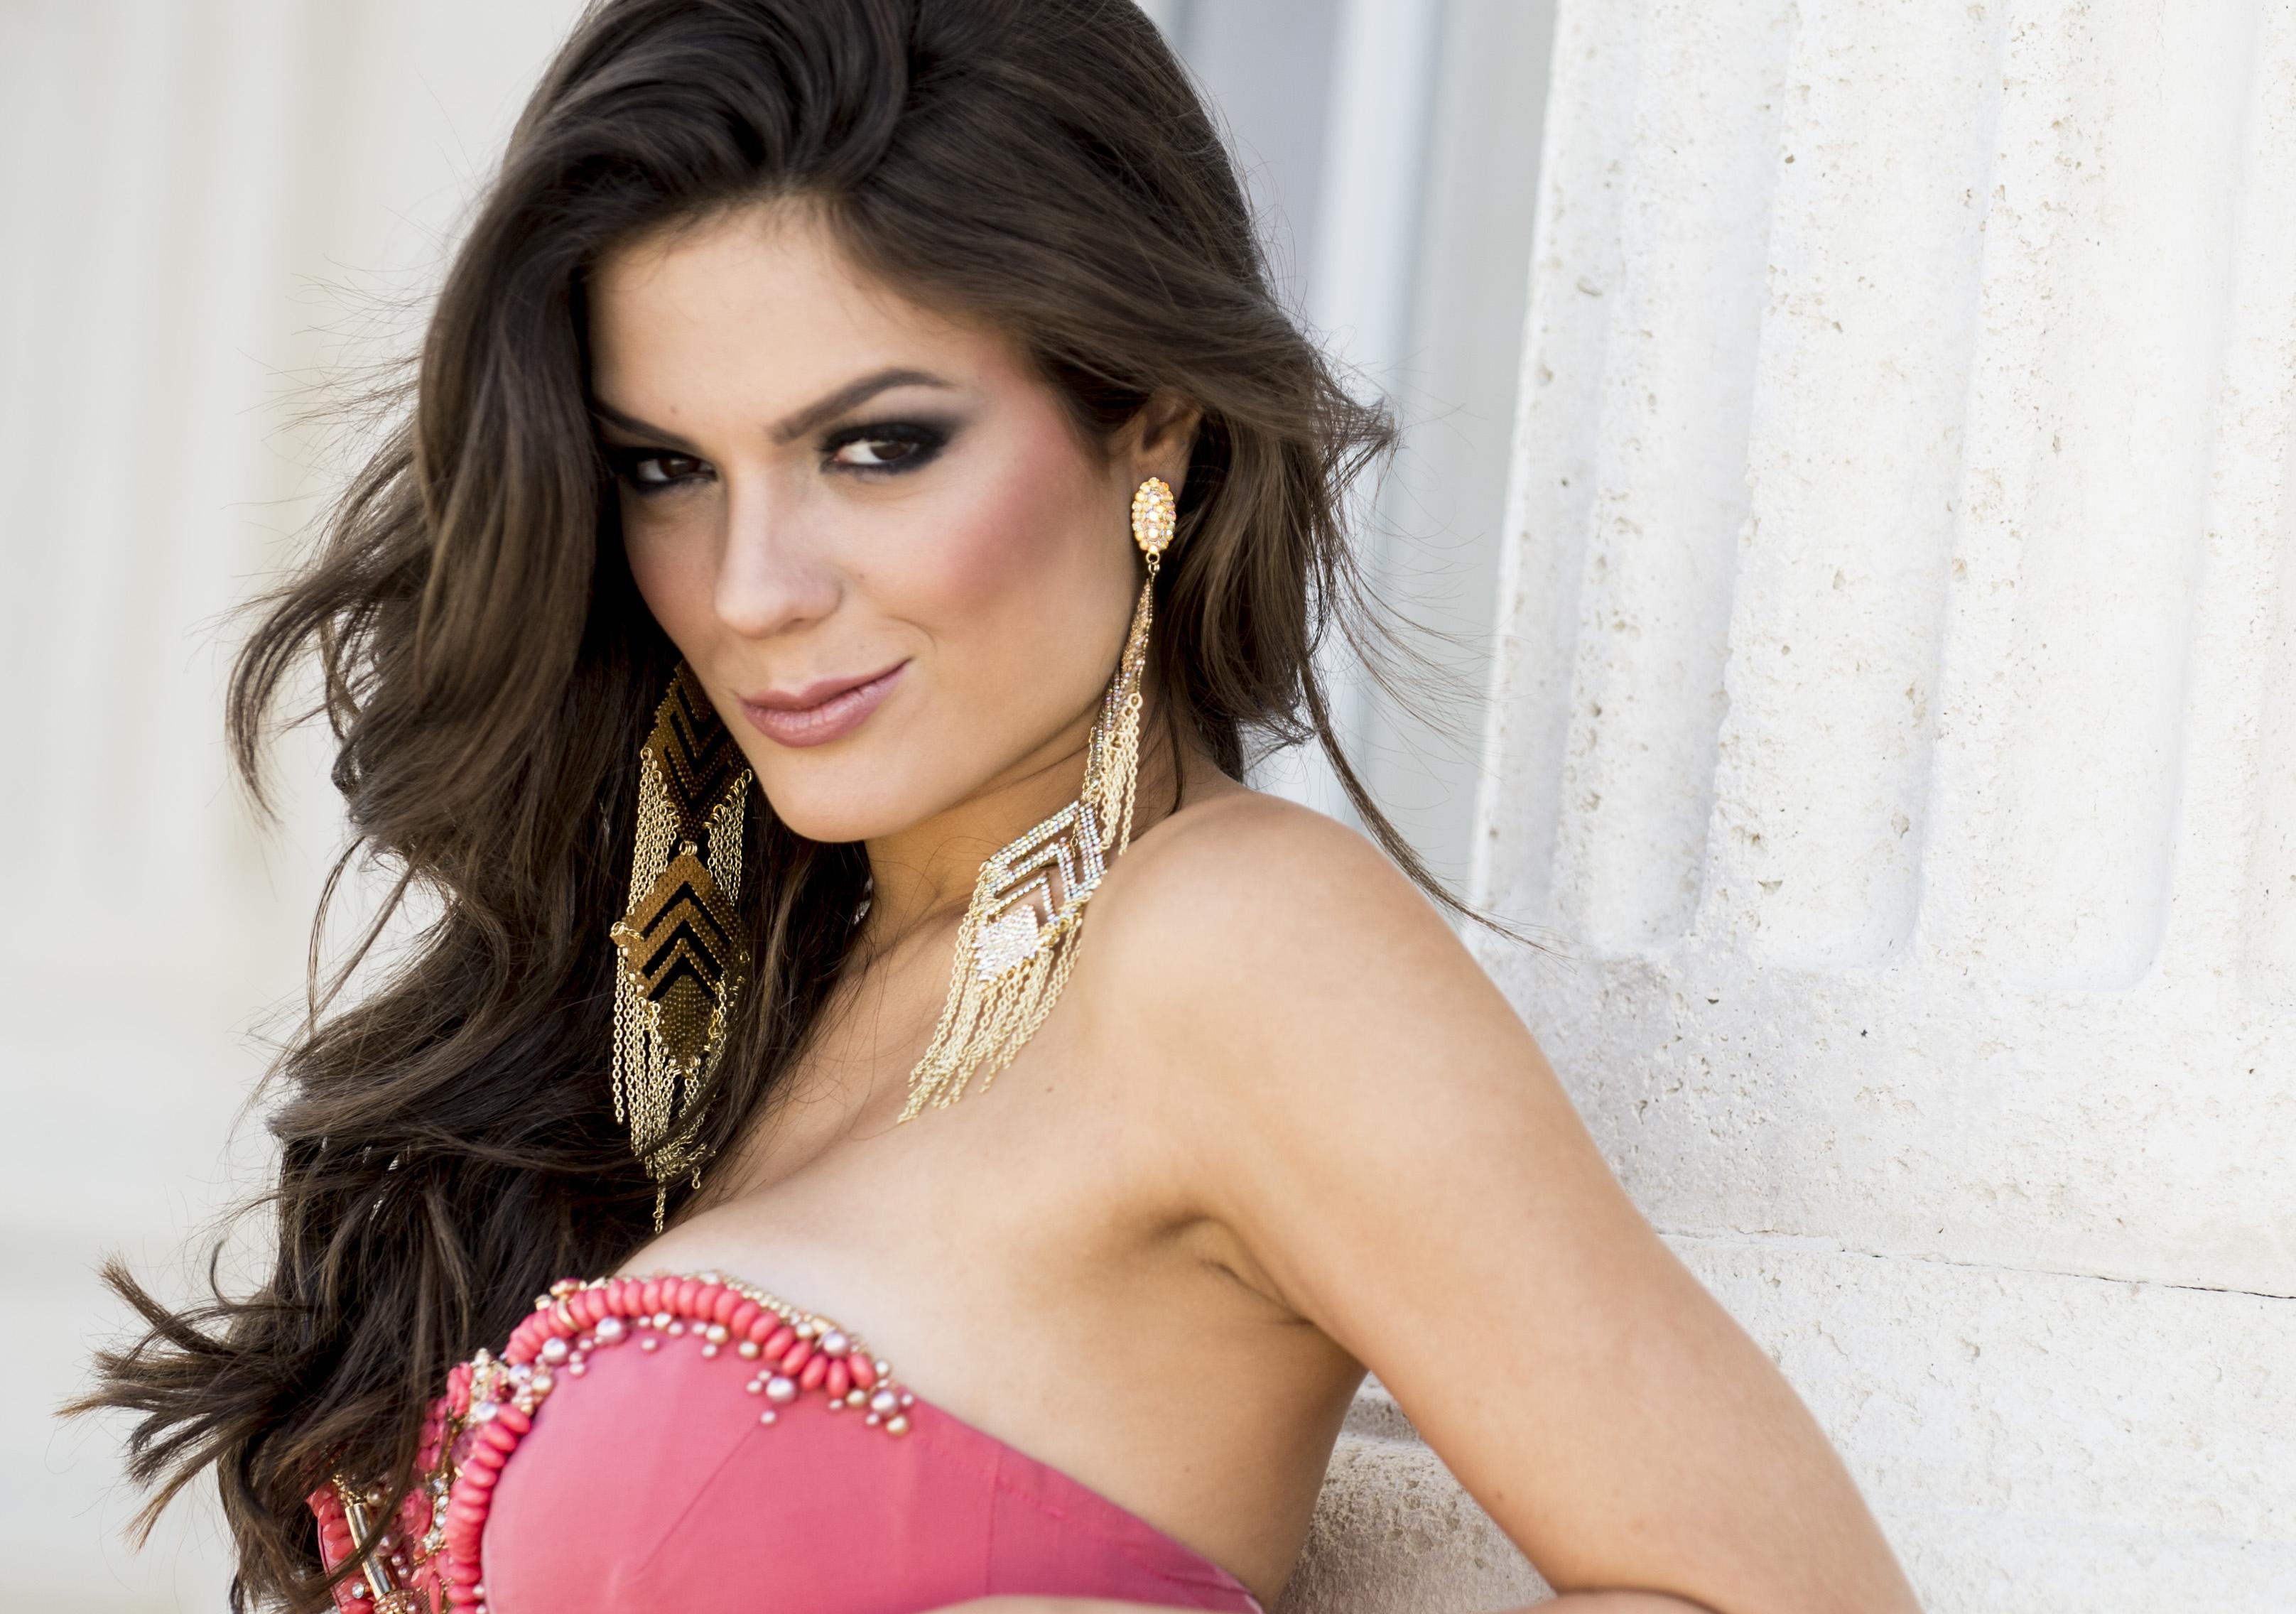 melissa gurgel, miss brasil 2014. Melissa-gurgel-miss-brasil-universo-2014_rgs3